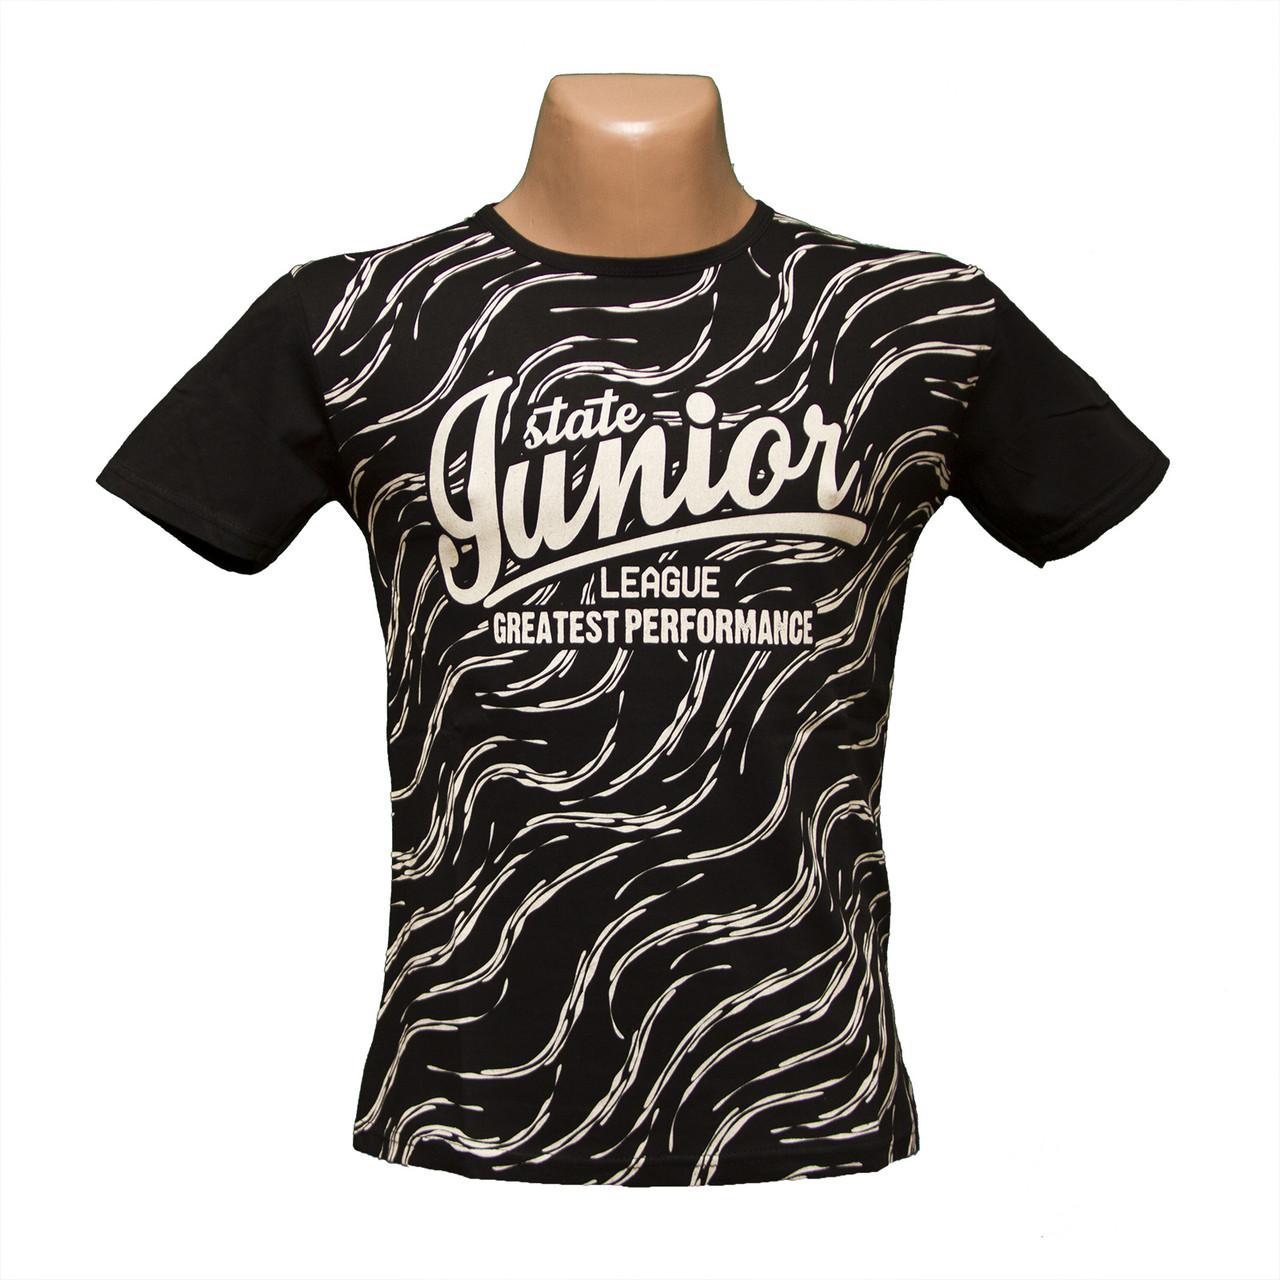 Молодежная Турецкая футболка 5227-1